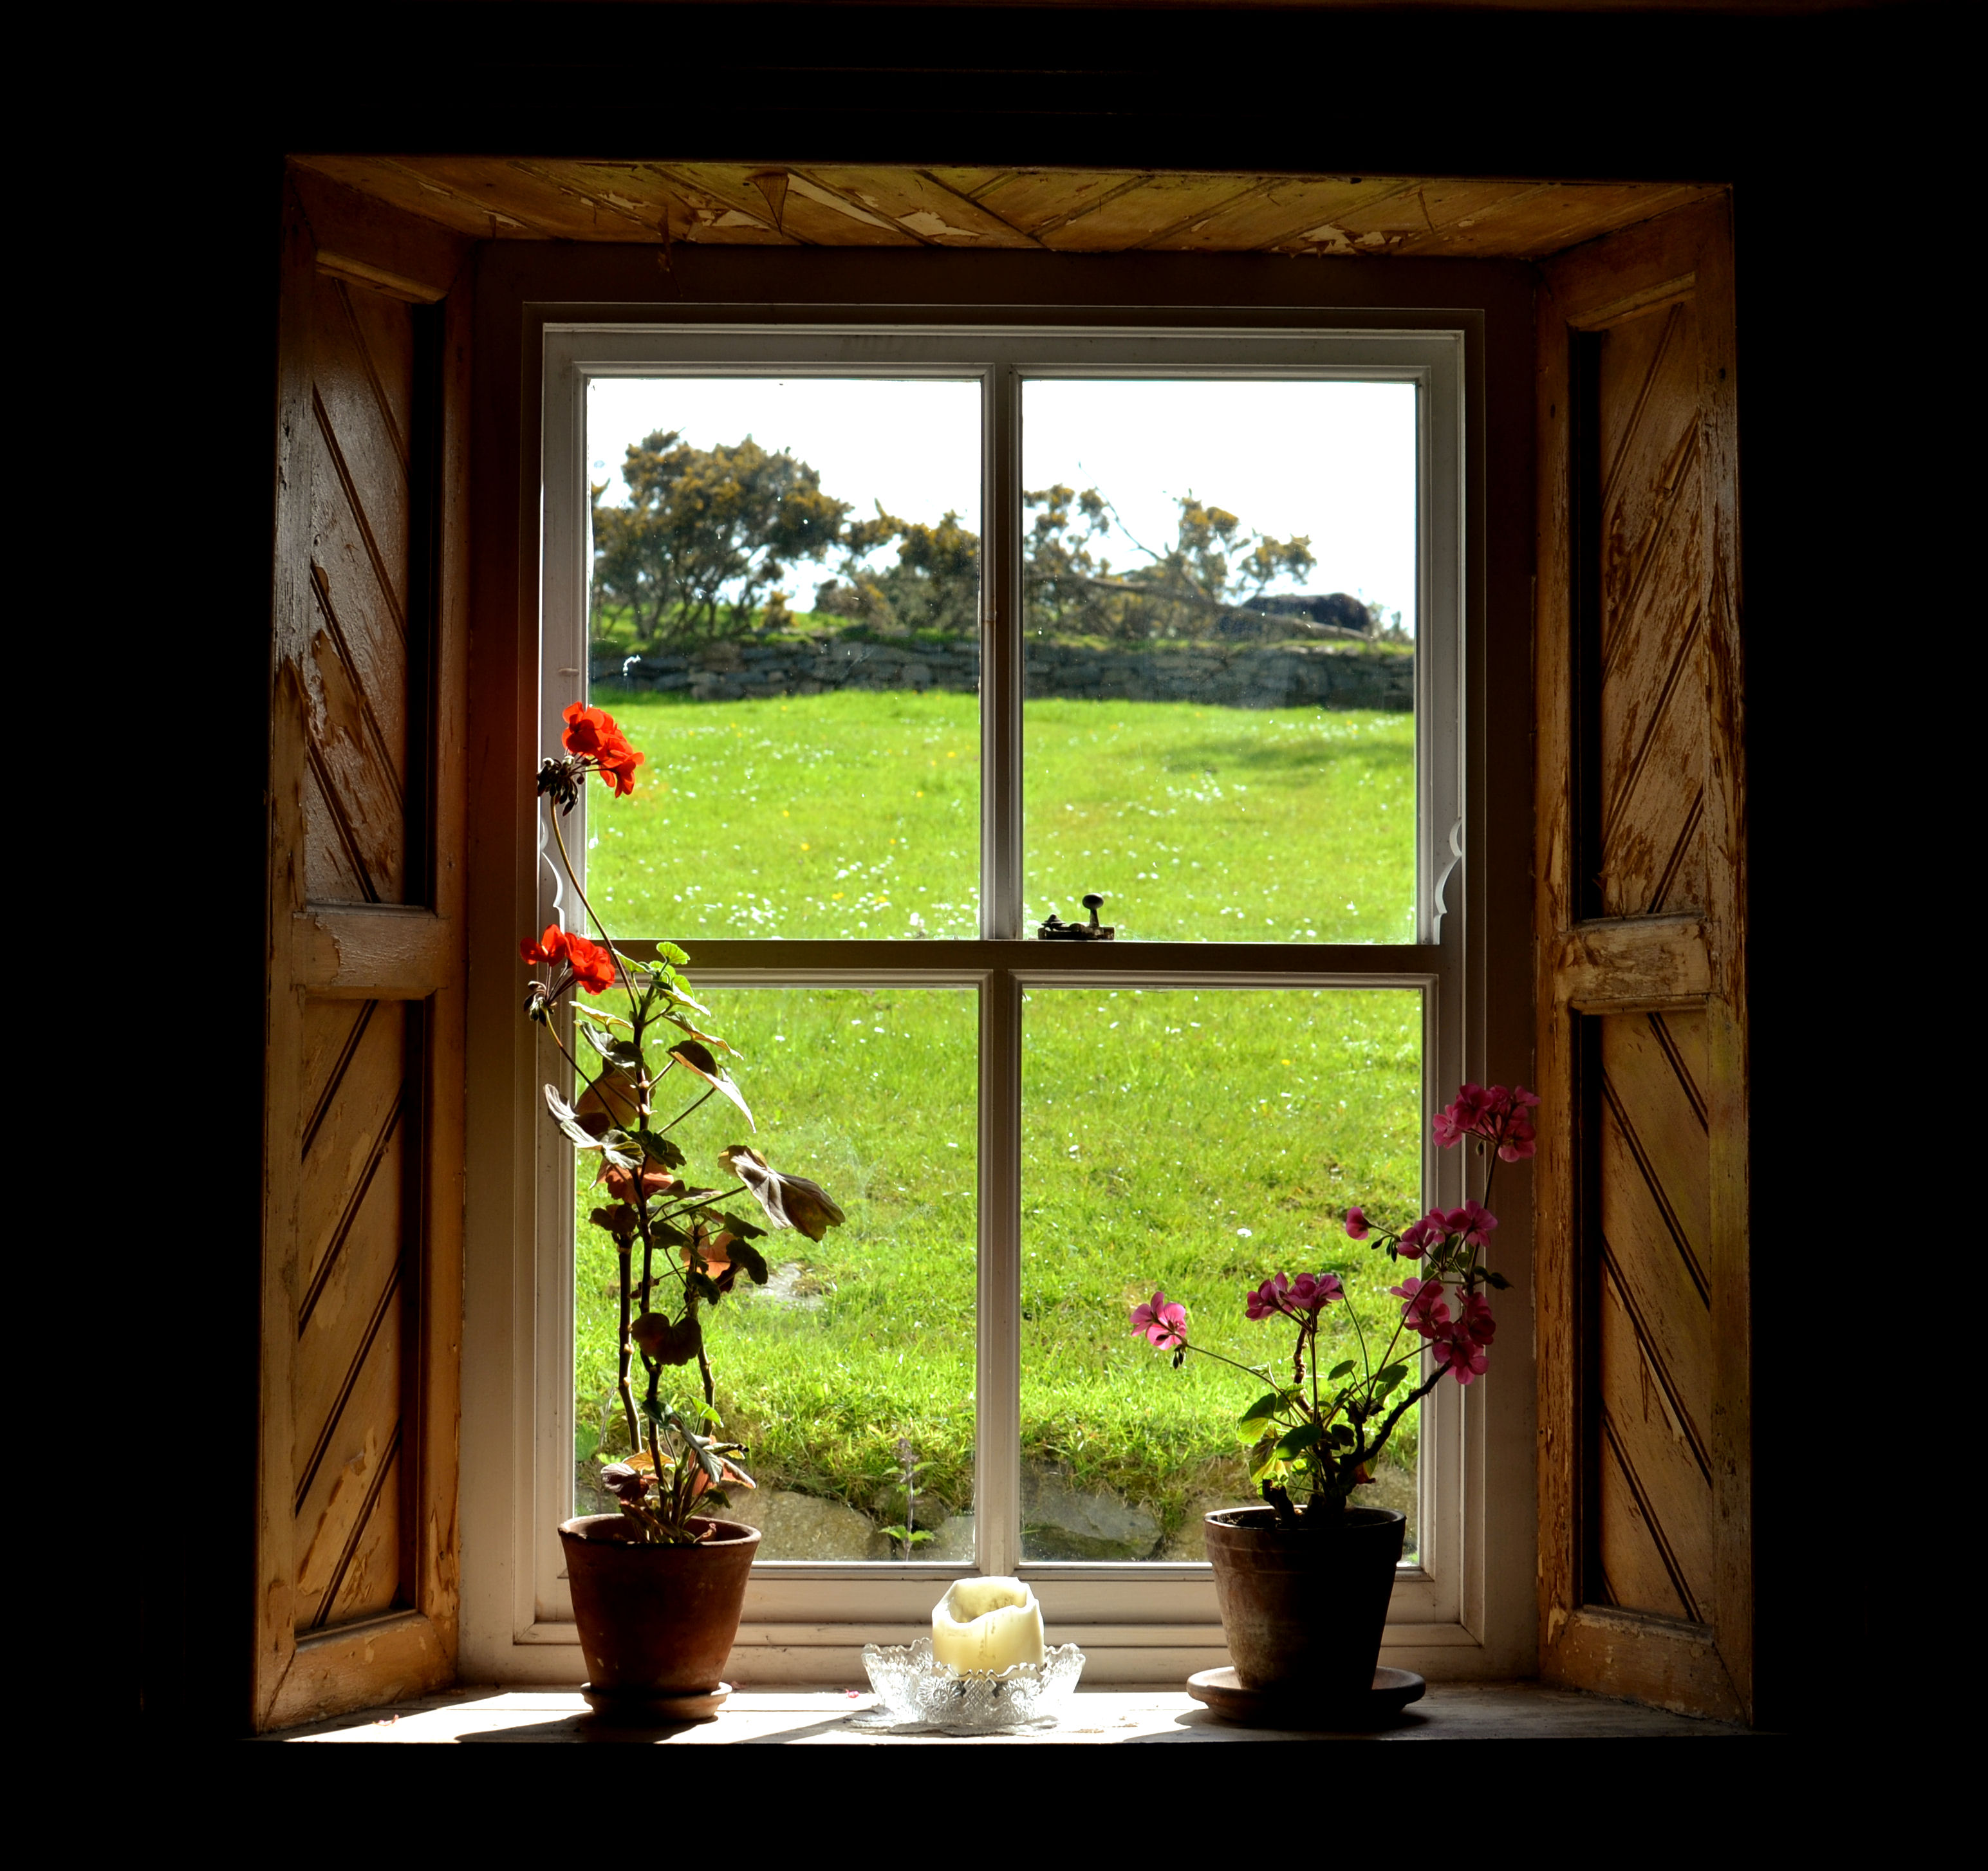 e48a1837dc49 Composure through the window … – Photo s by David Roulston